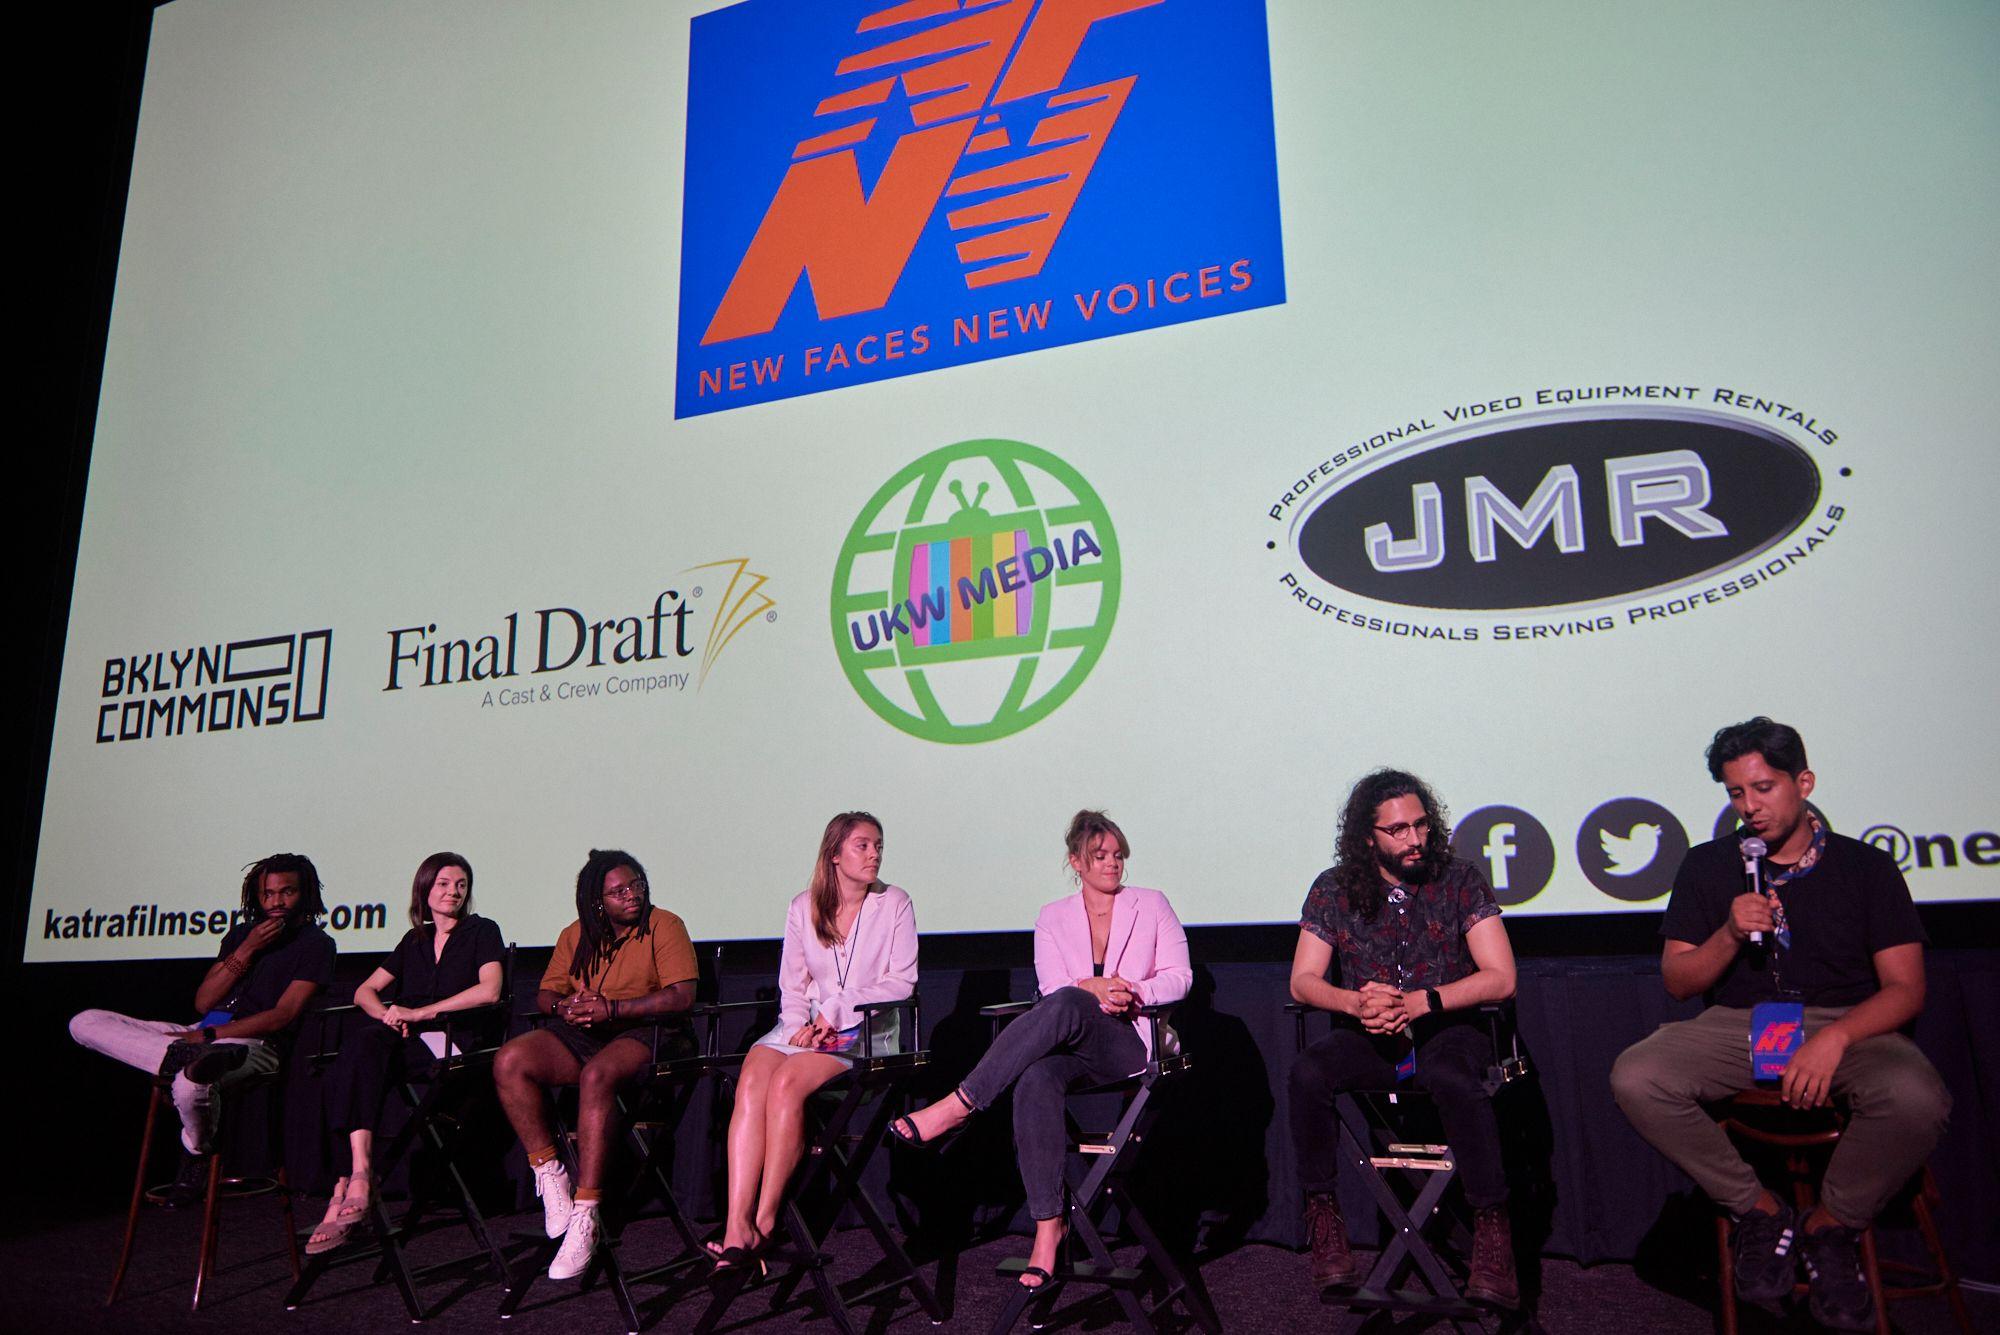 New Faces, New Voices Film Festival Reunites Cinephiles